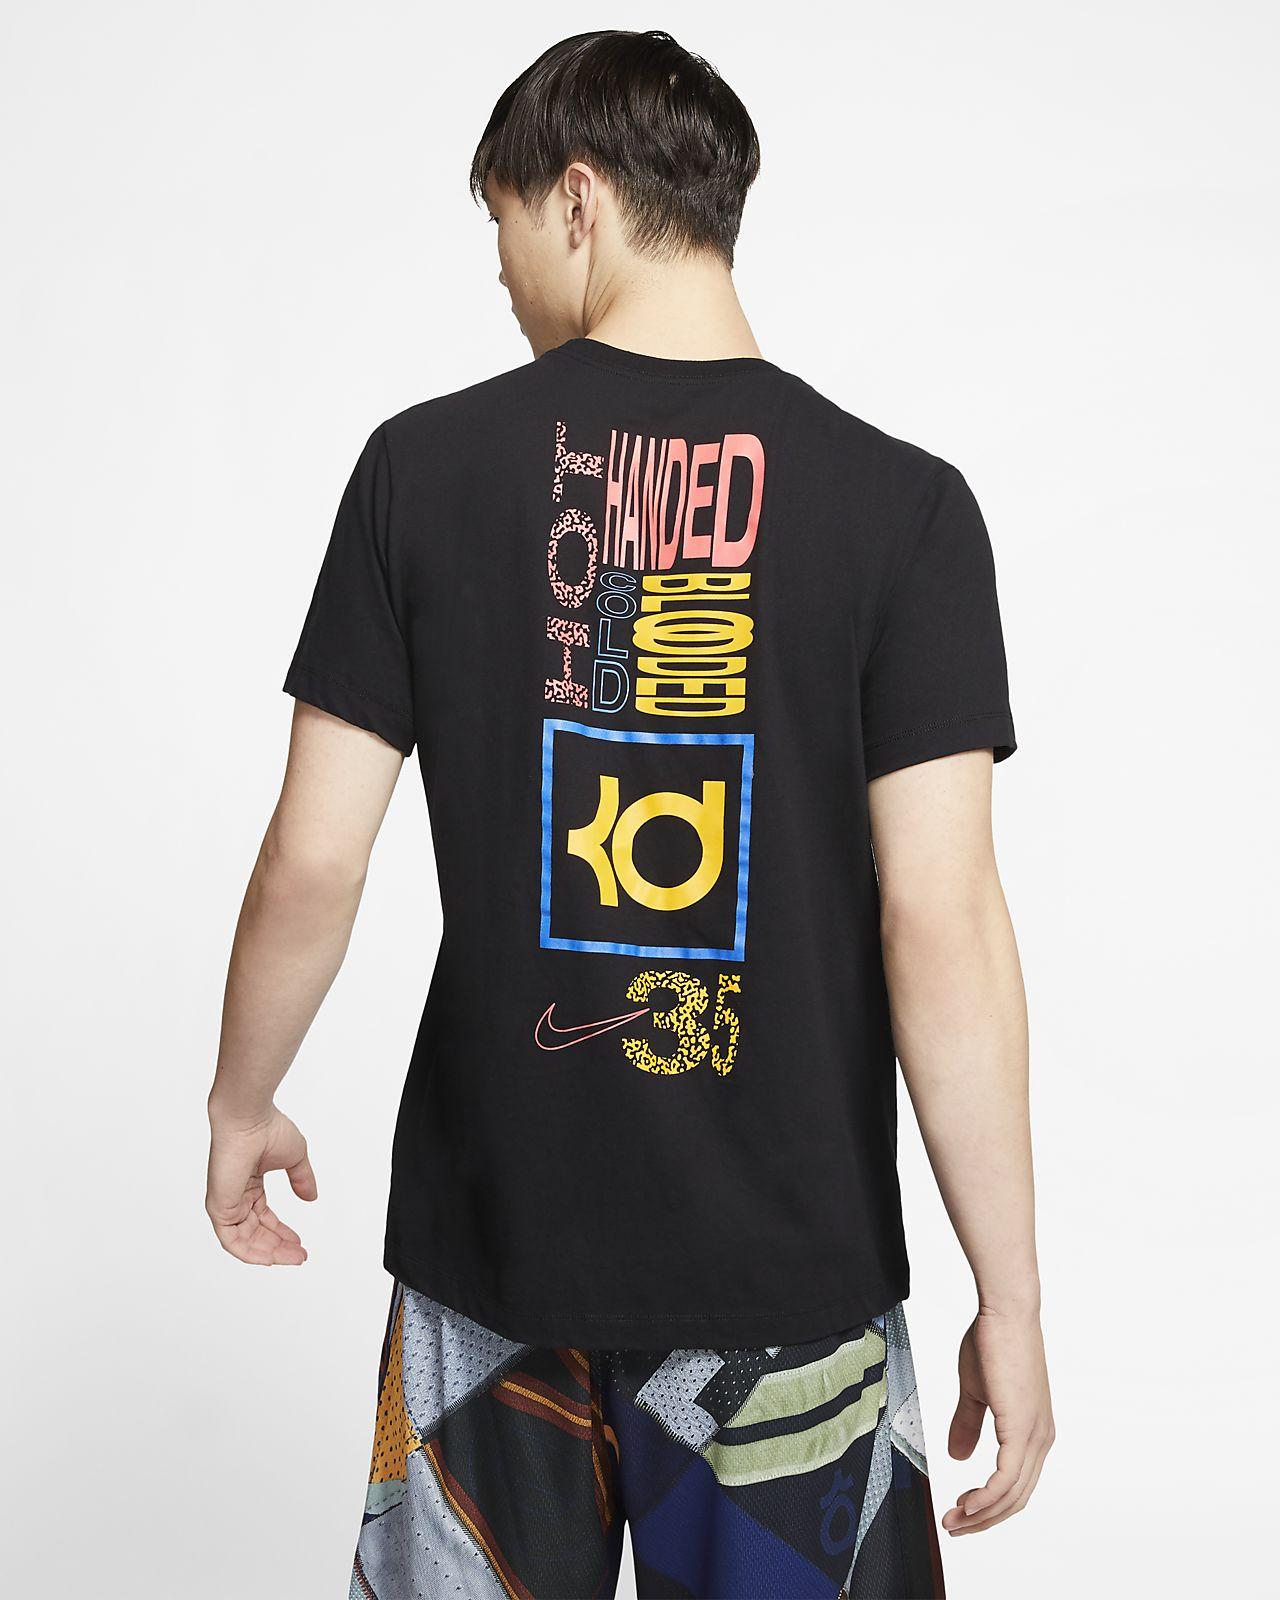 KD T Shirt Nike Dri-FIT KD Men's Basketball T-Shirt. Nike ID